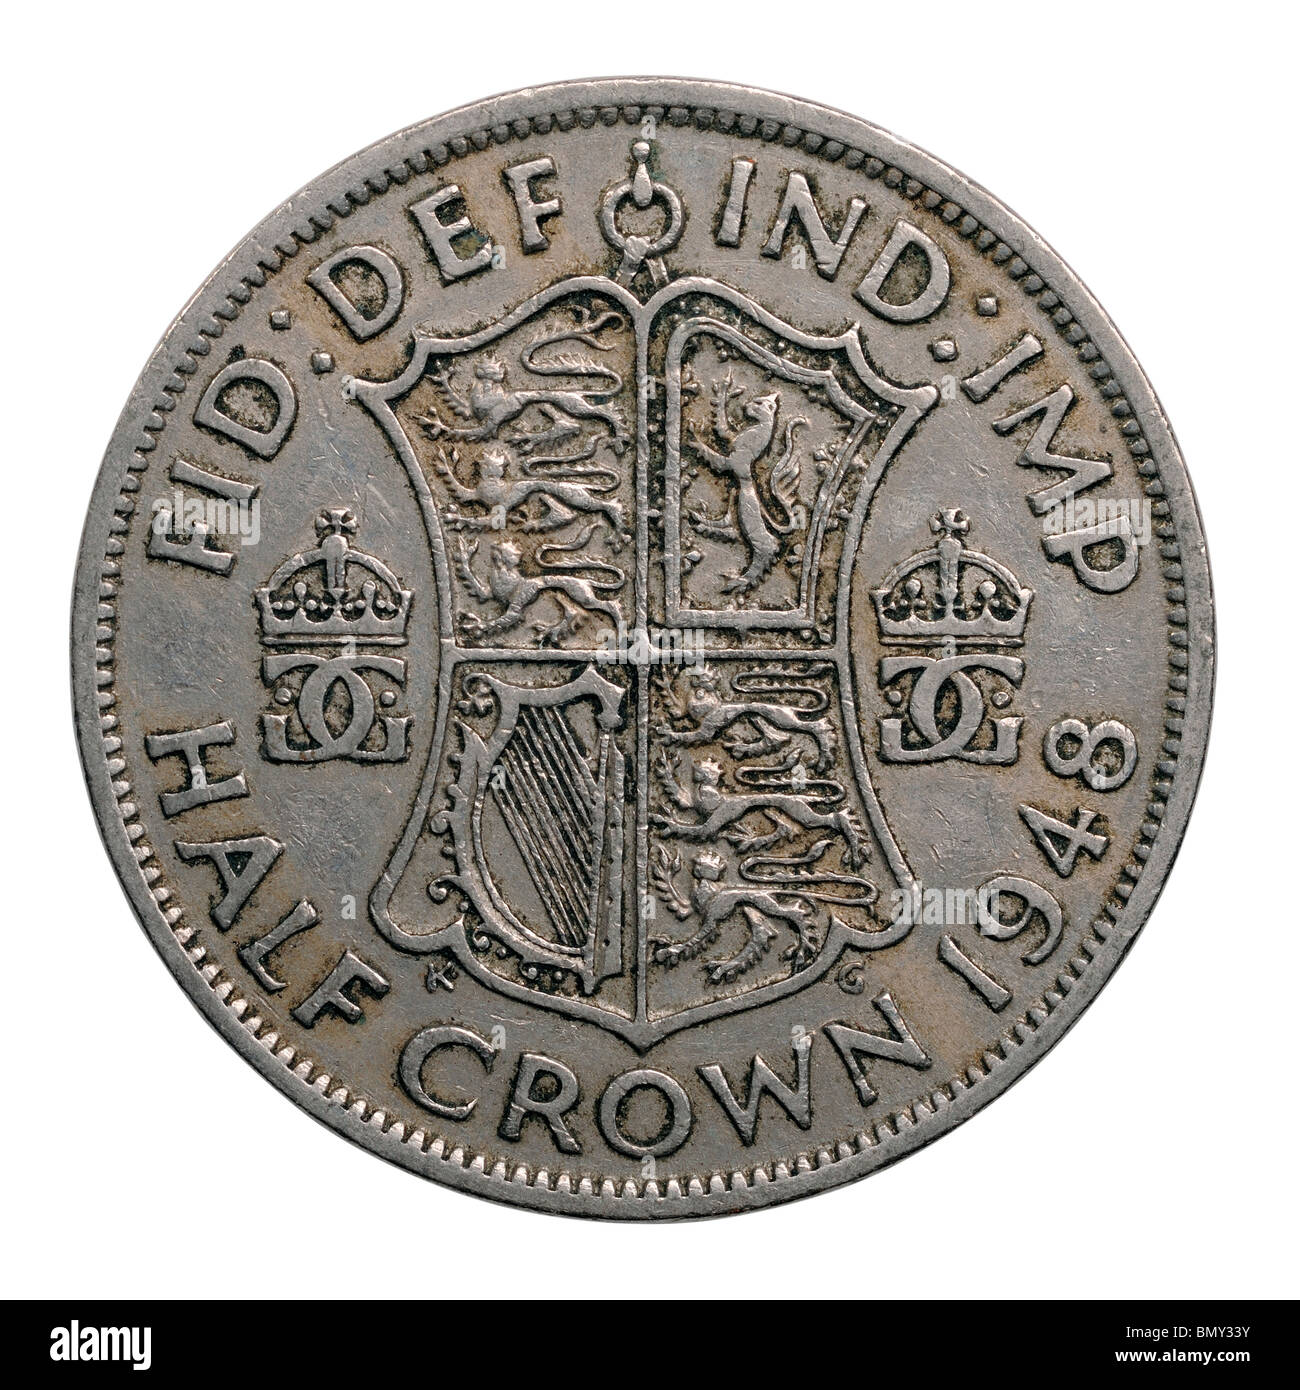 1948 half crown coin king george vi - Stock Image